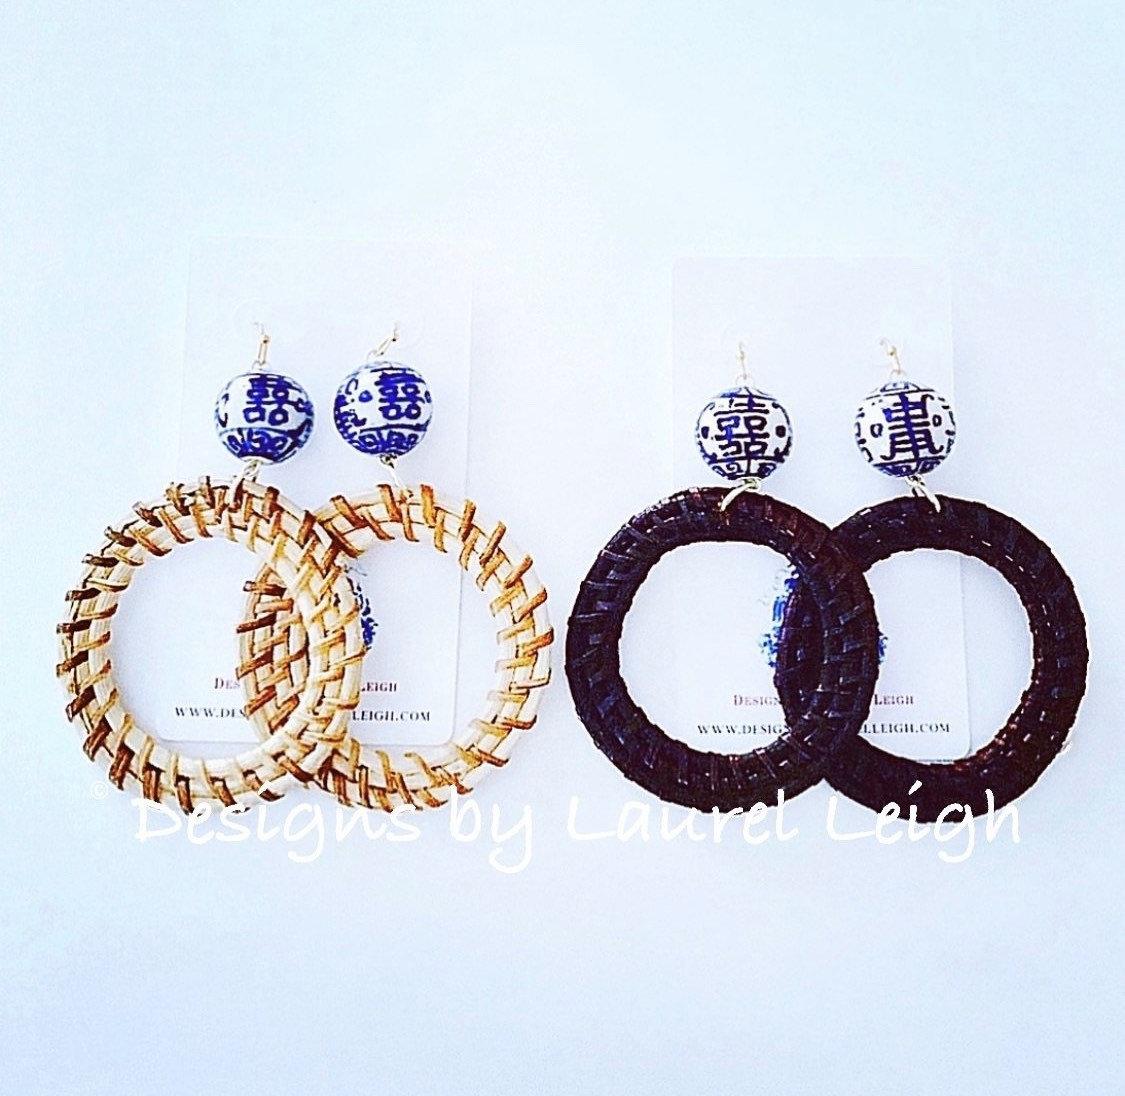 Lightweight Earrings Hand Painted Earrings Chinoiserie Earrings Pagoda Earrings Blue Earrings Statement Earrings